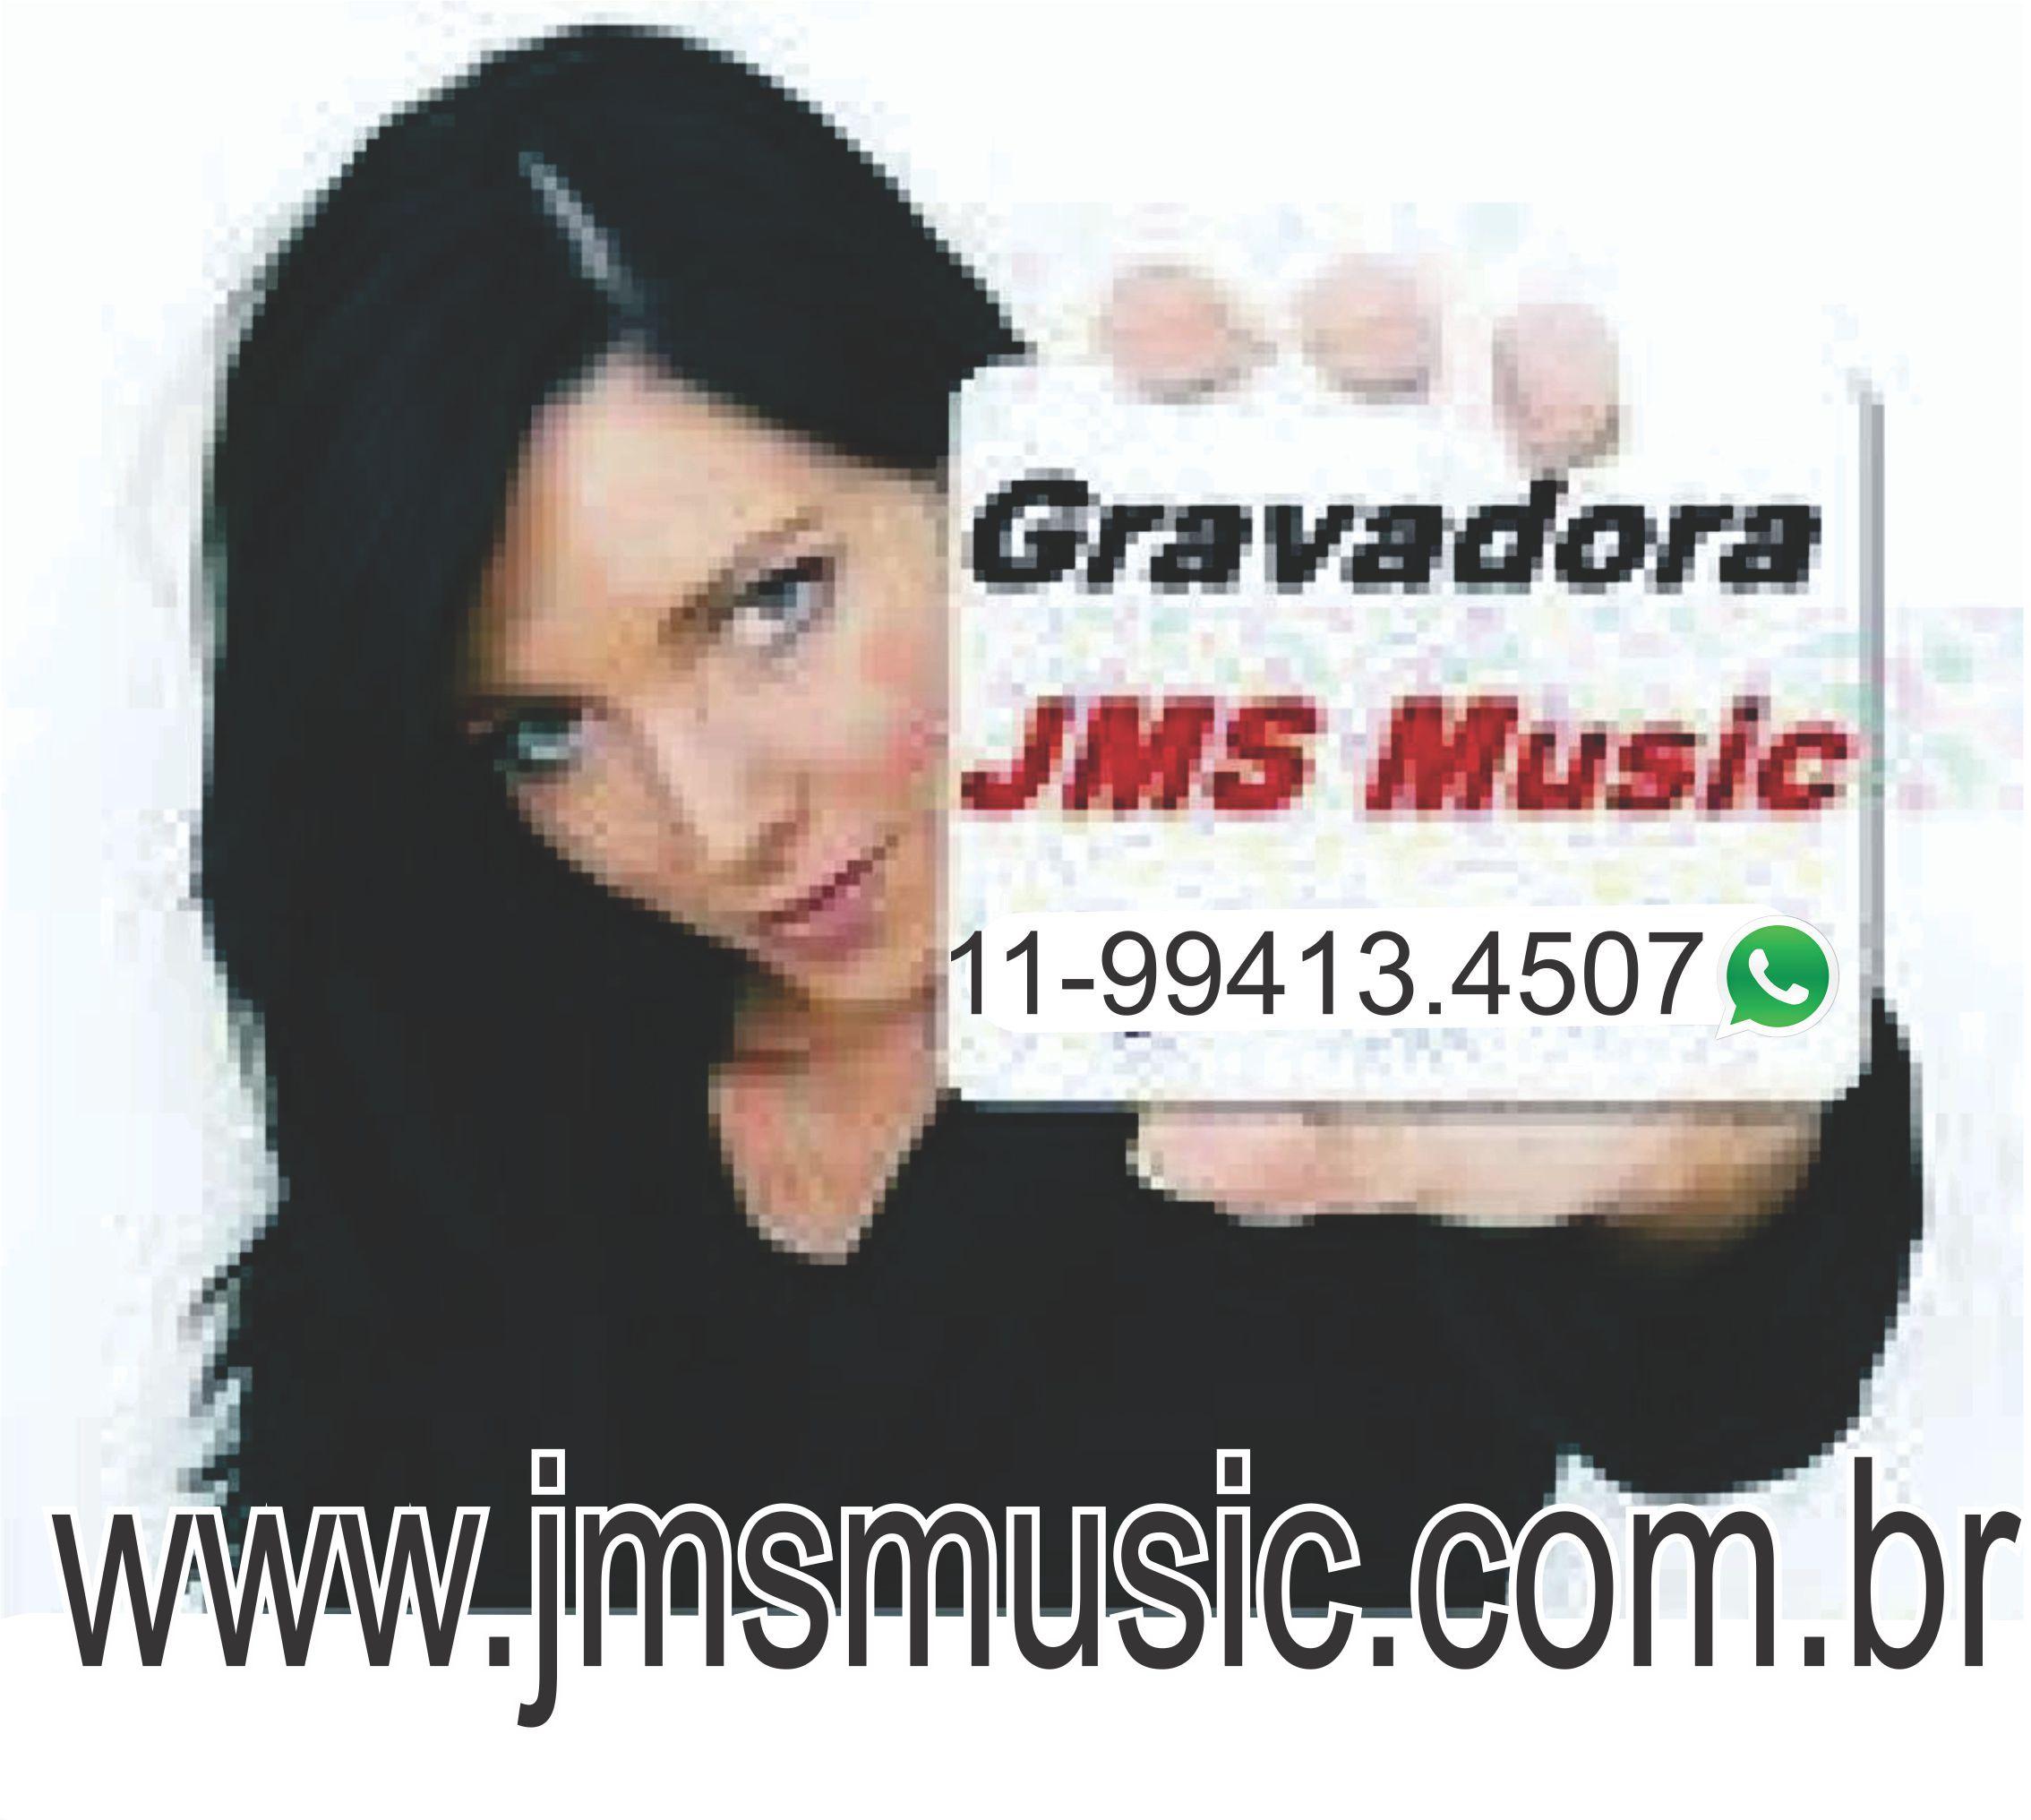 Gravadora JMS Music